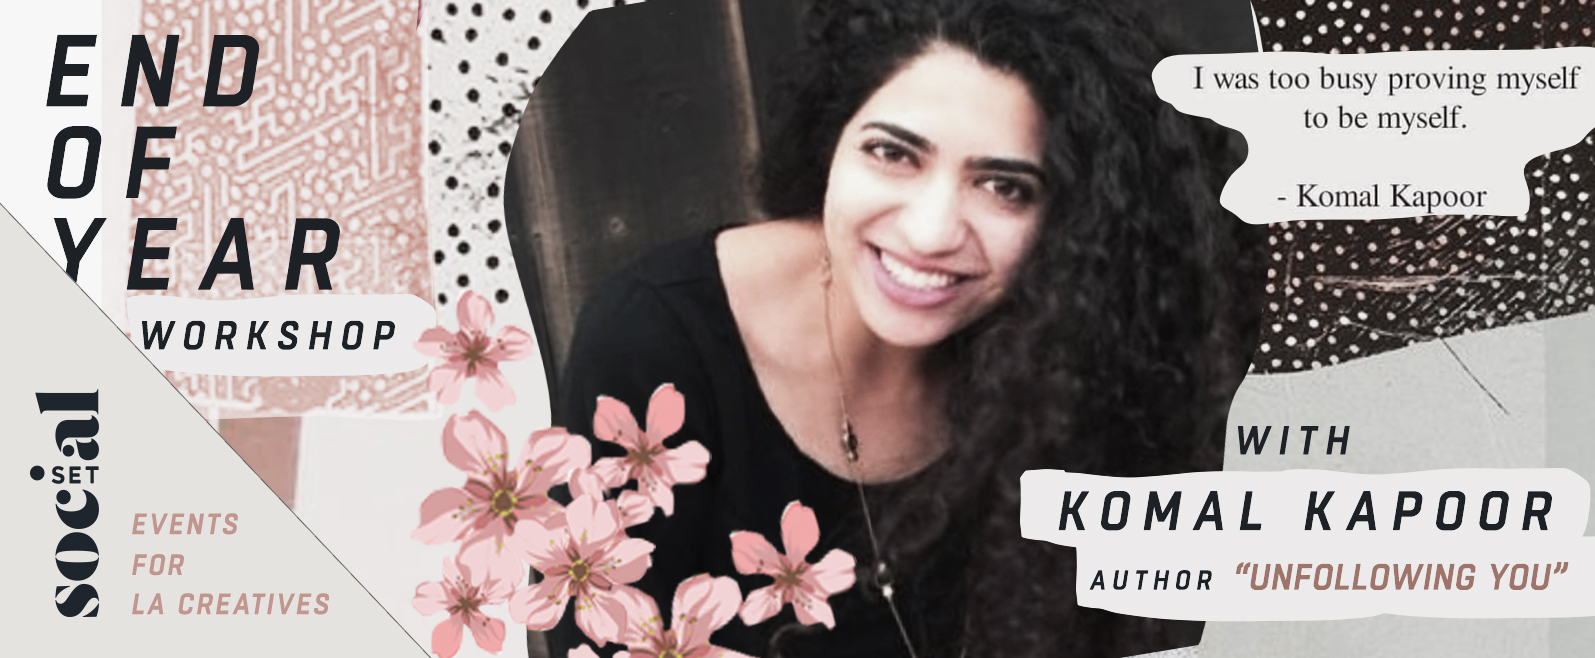 Komal_Workshop_Social_Set.jpg